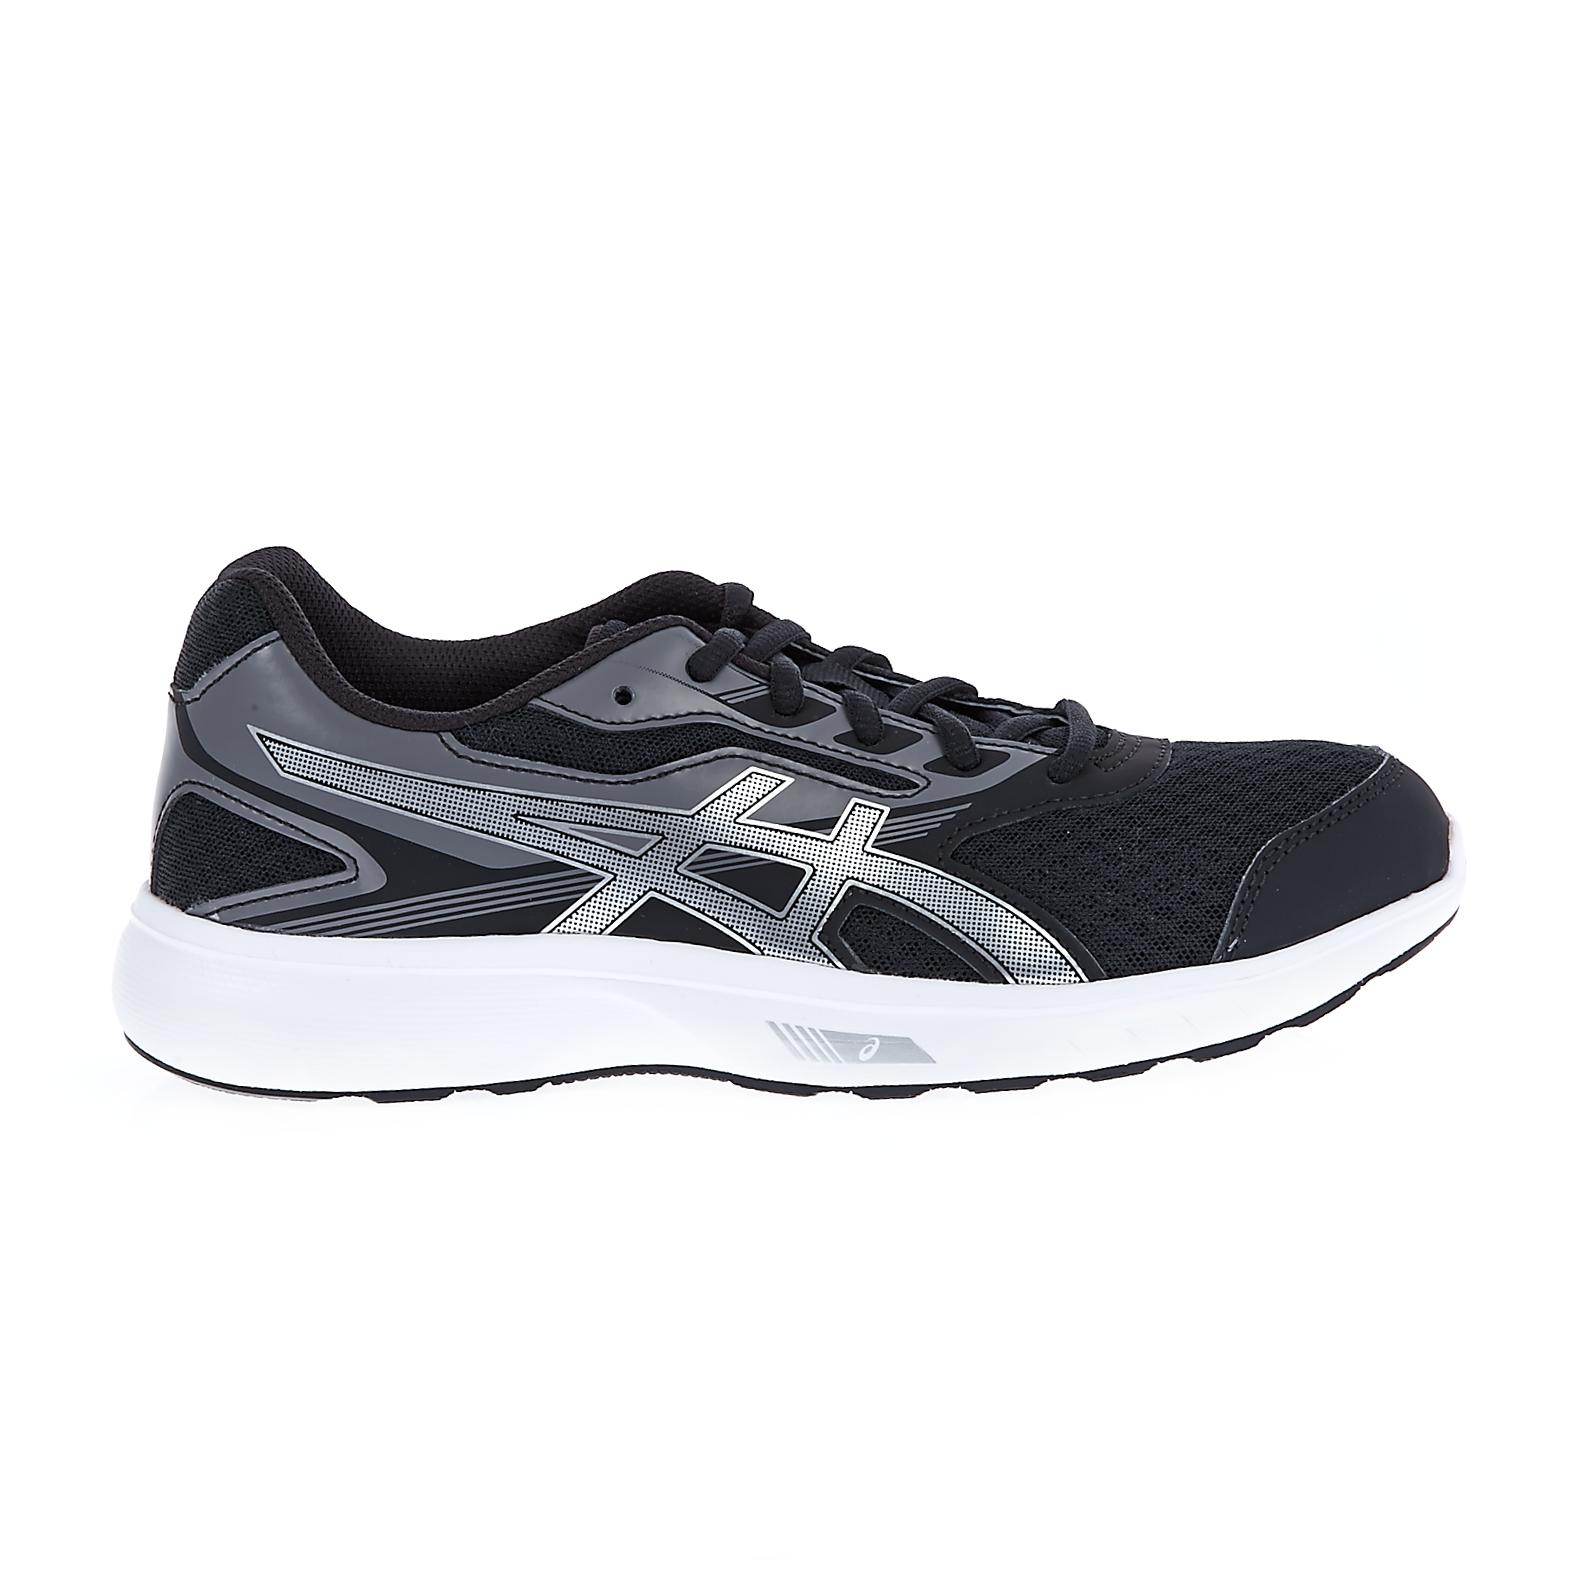 ASICS - Παιδικά αθλητικά παπούτσια ASICS STORMER GS μαύρα παιδικά boys παπούτσια αθλητικά